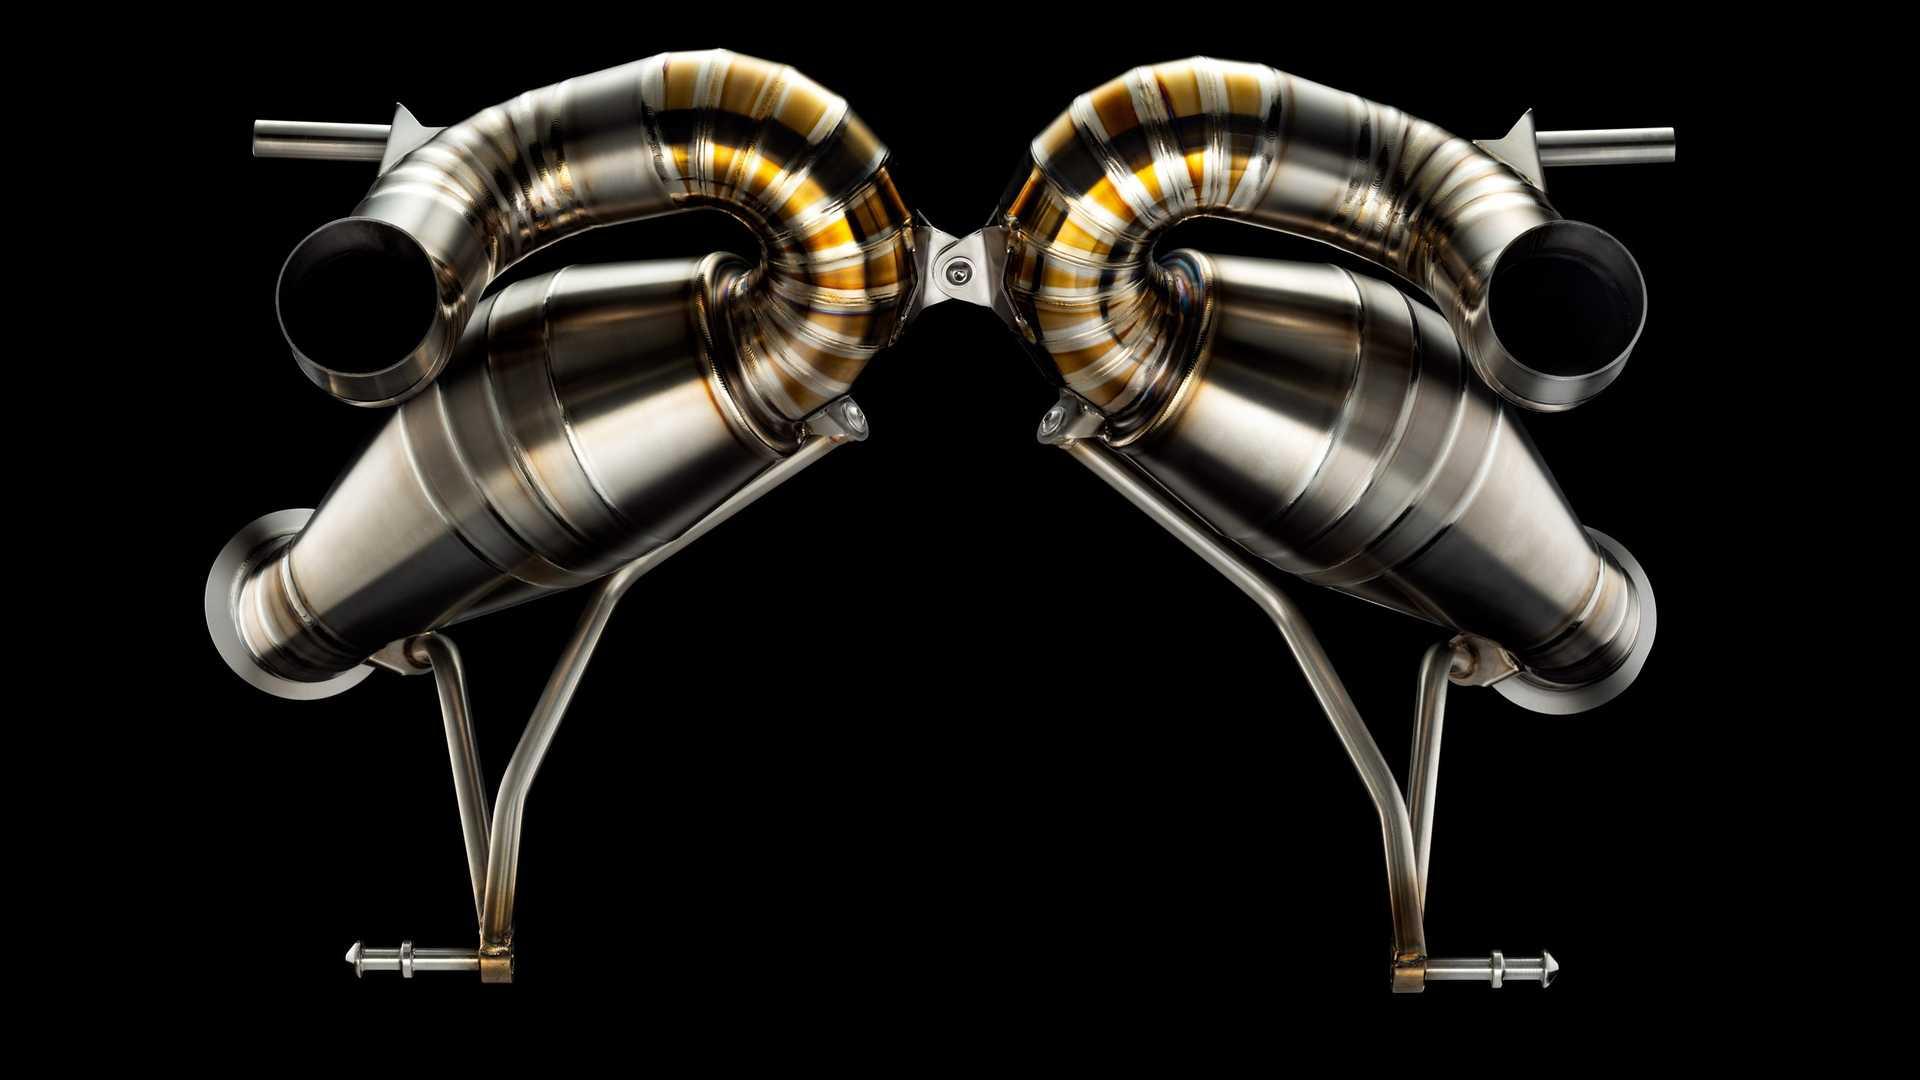 Aventador_SVJ_With_Valentino_Balboni_Exhaust_0001